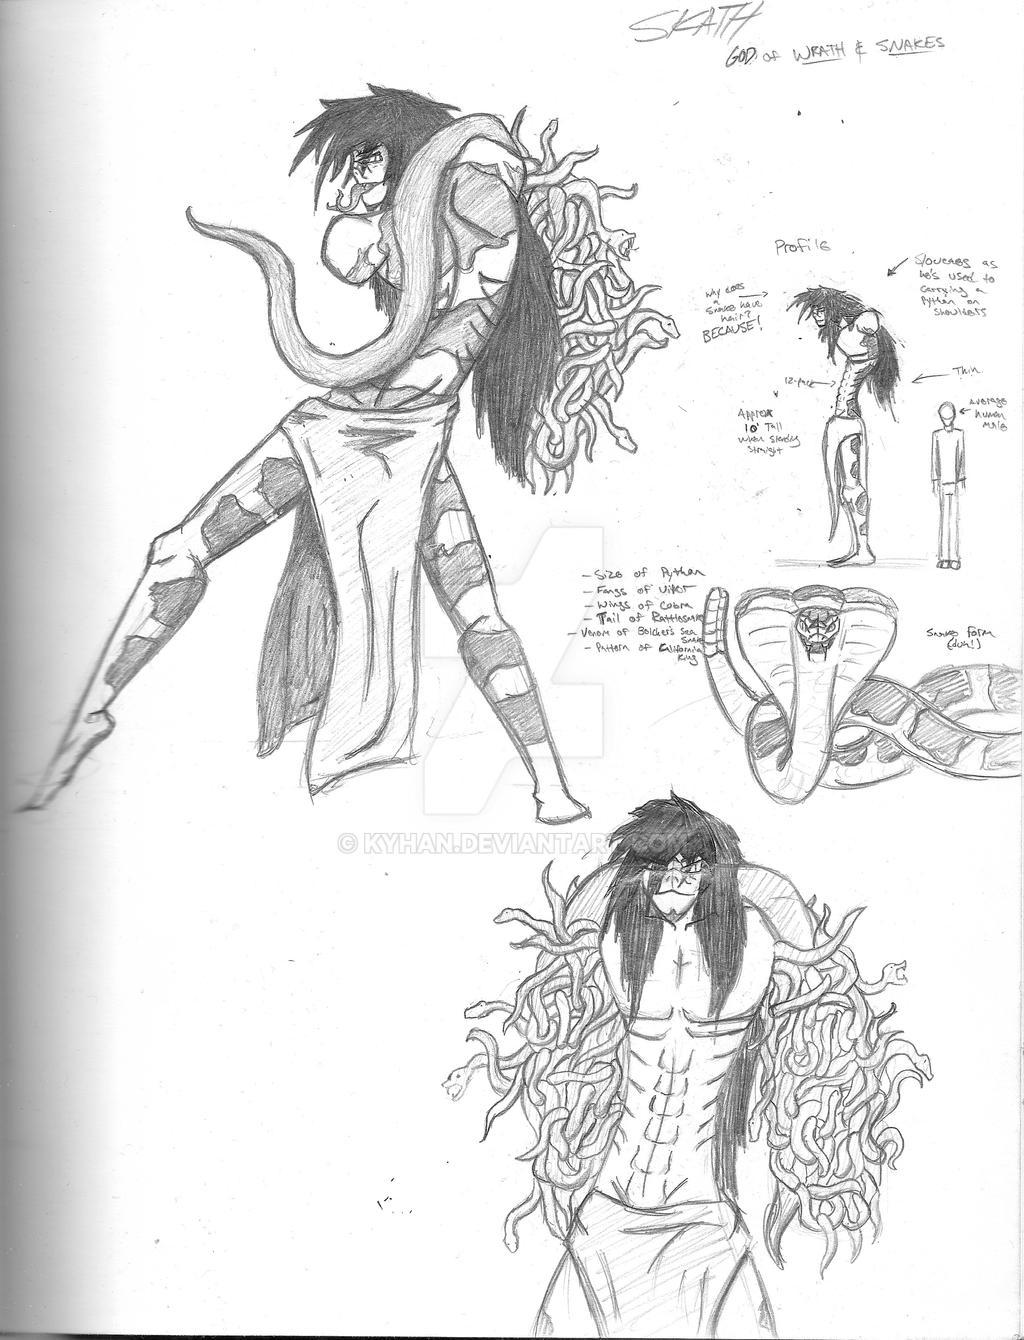 Skath, Enderan God of Snakes and Wrath